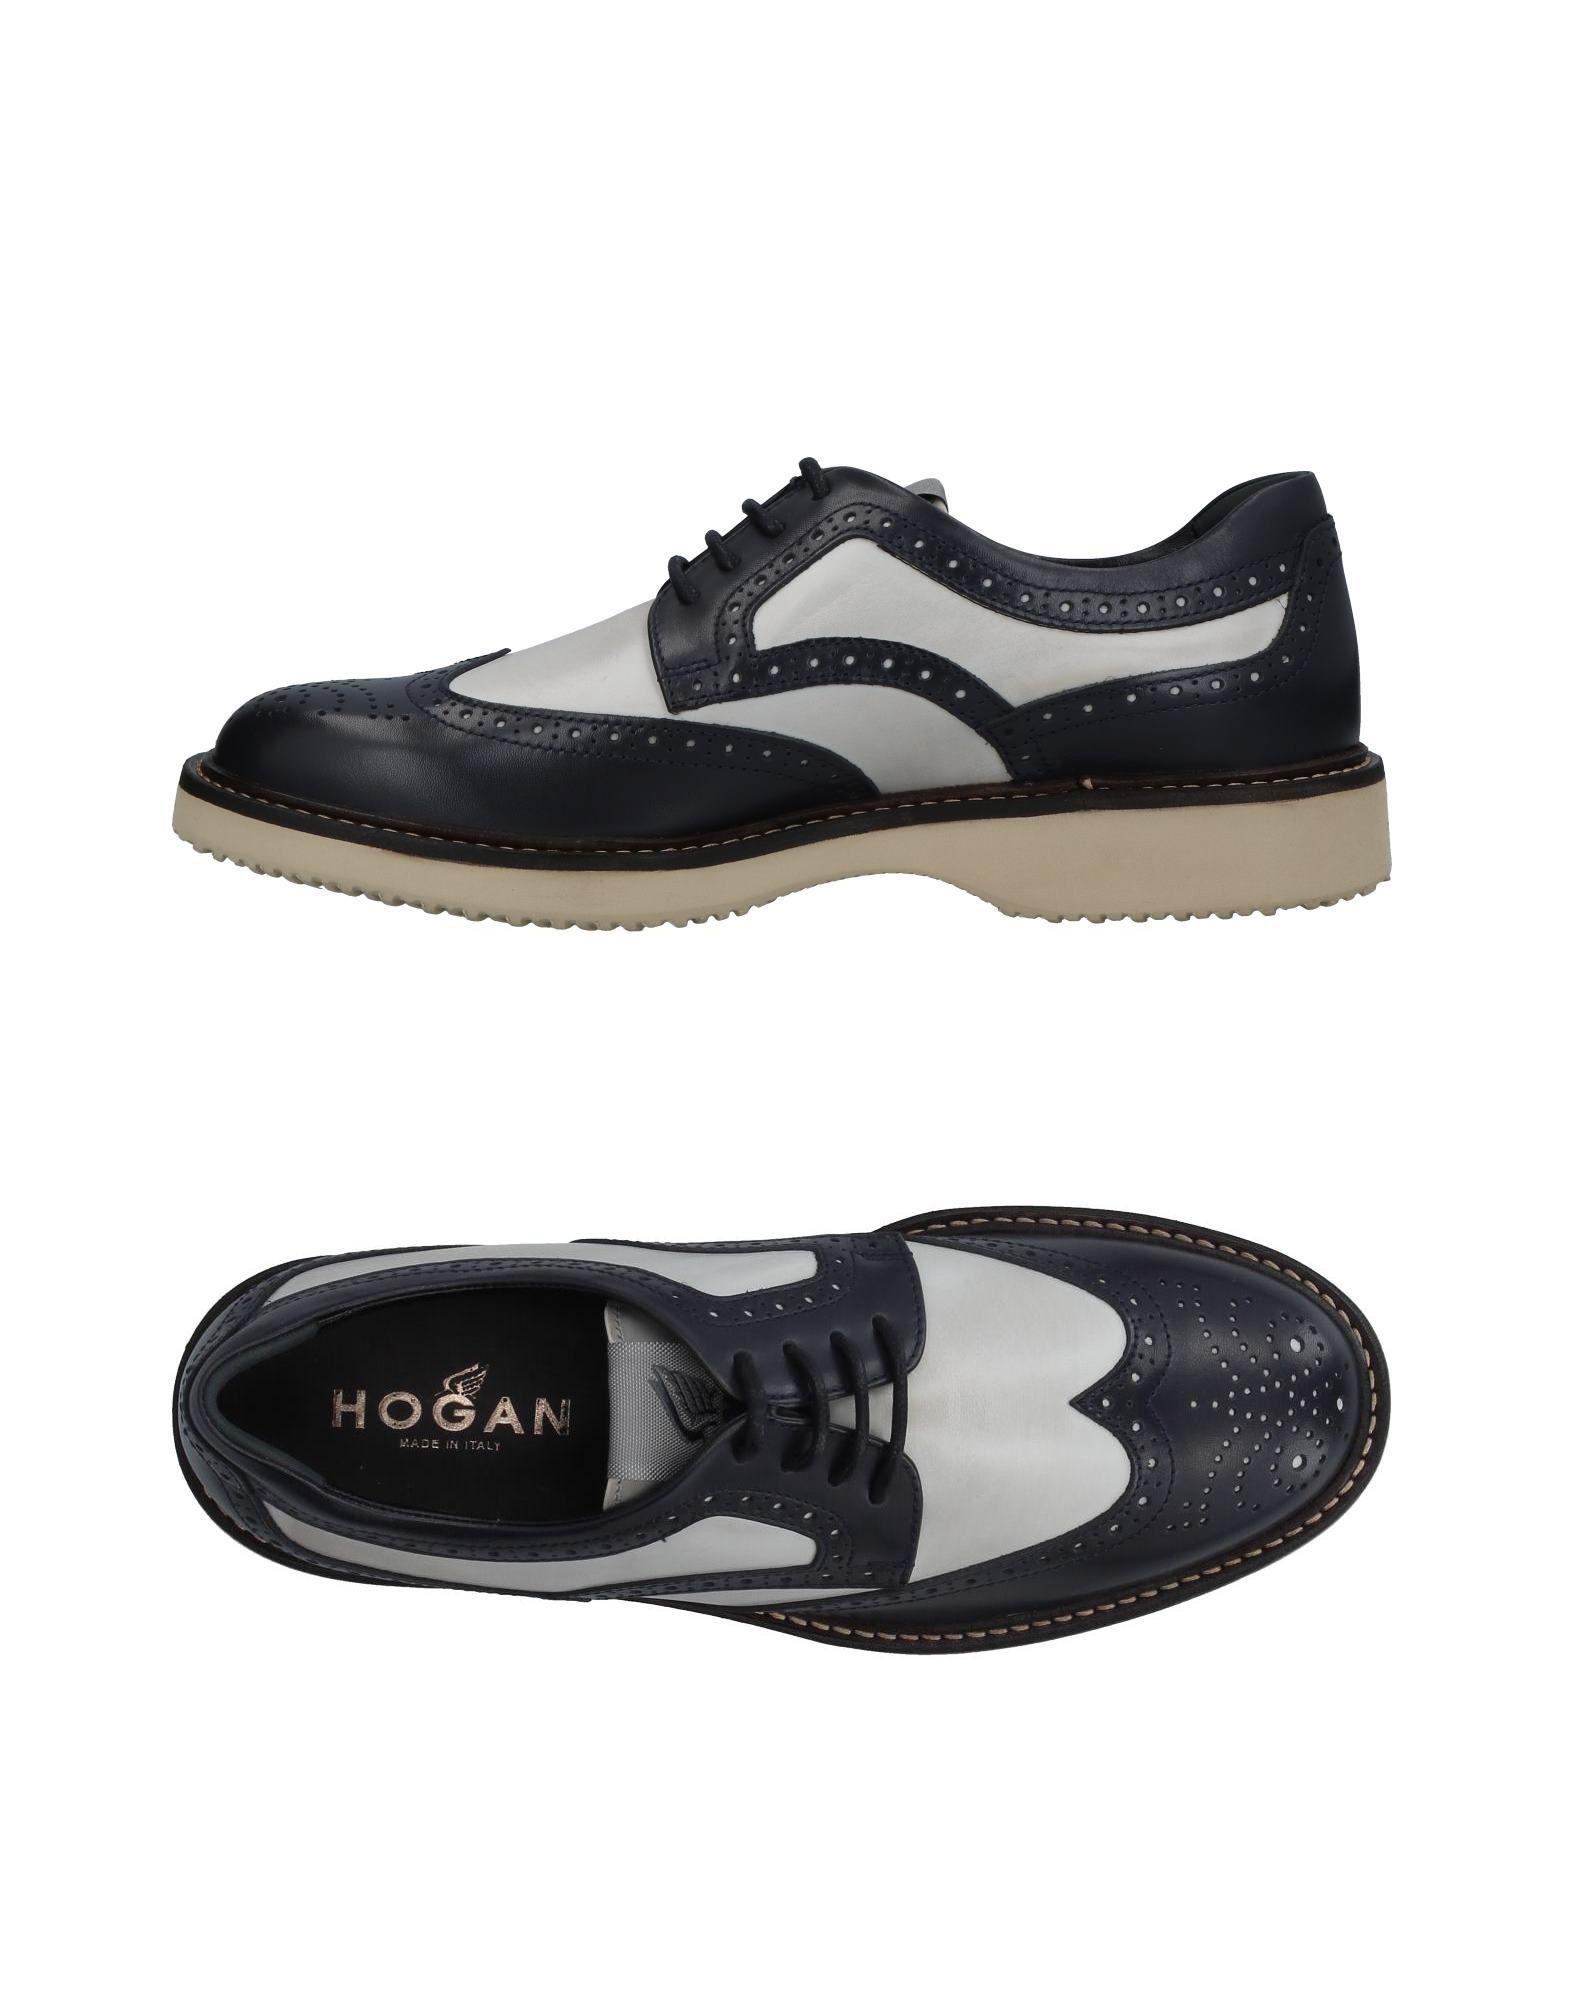 Stringate Hogan Uomo - 11395986RH elegante